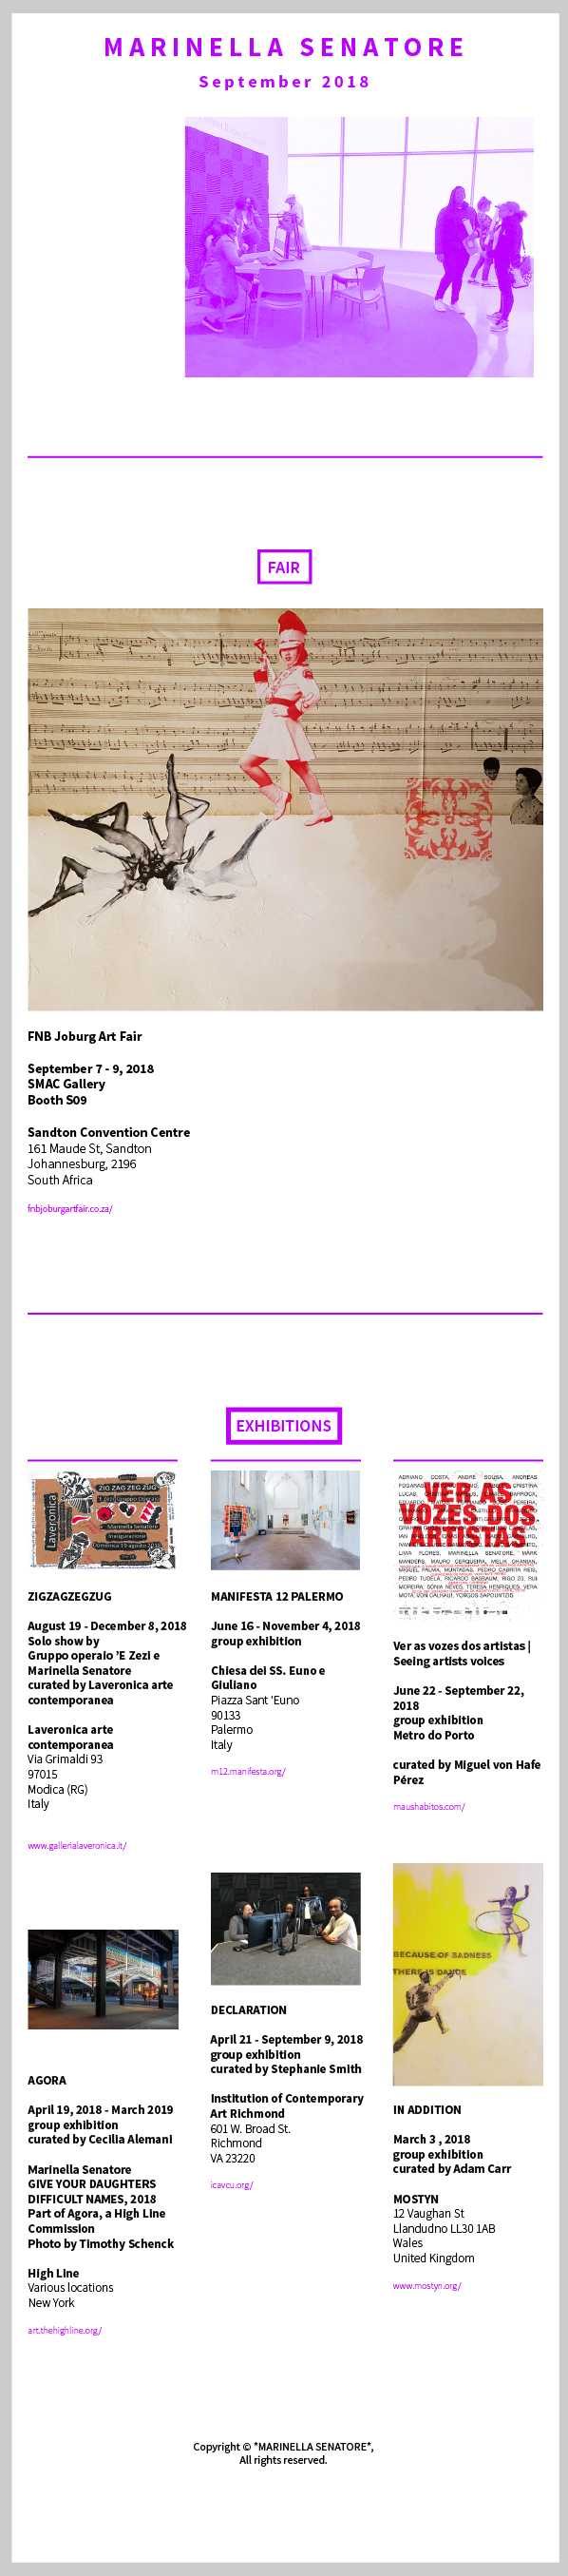 Studio Marinella Senatore Newsletter | September 2018